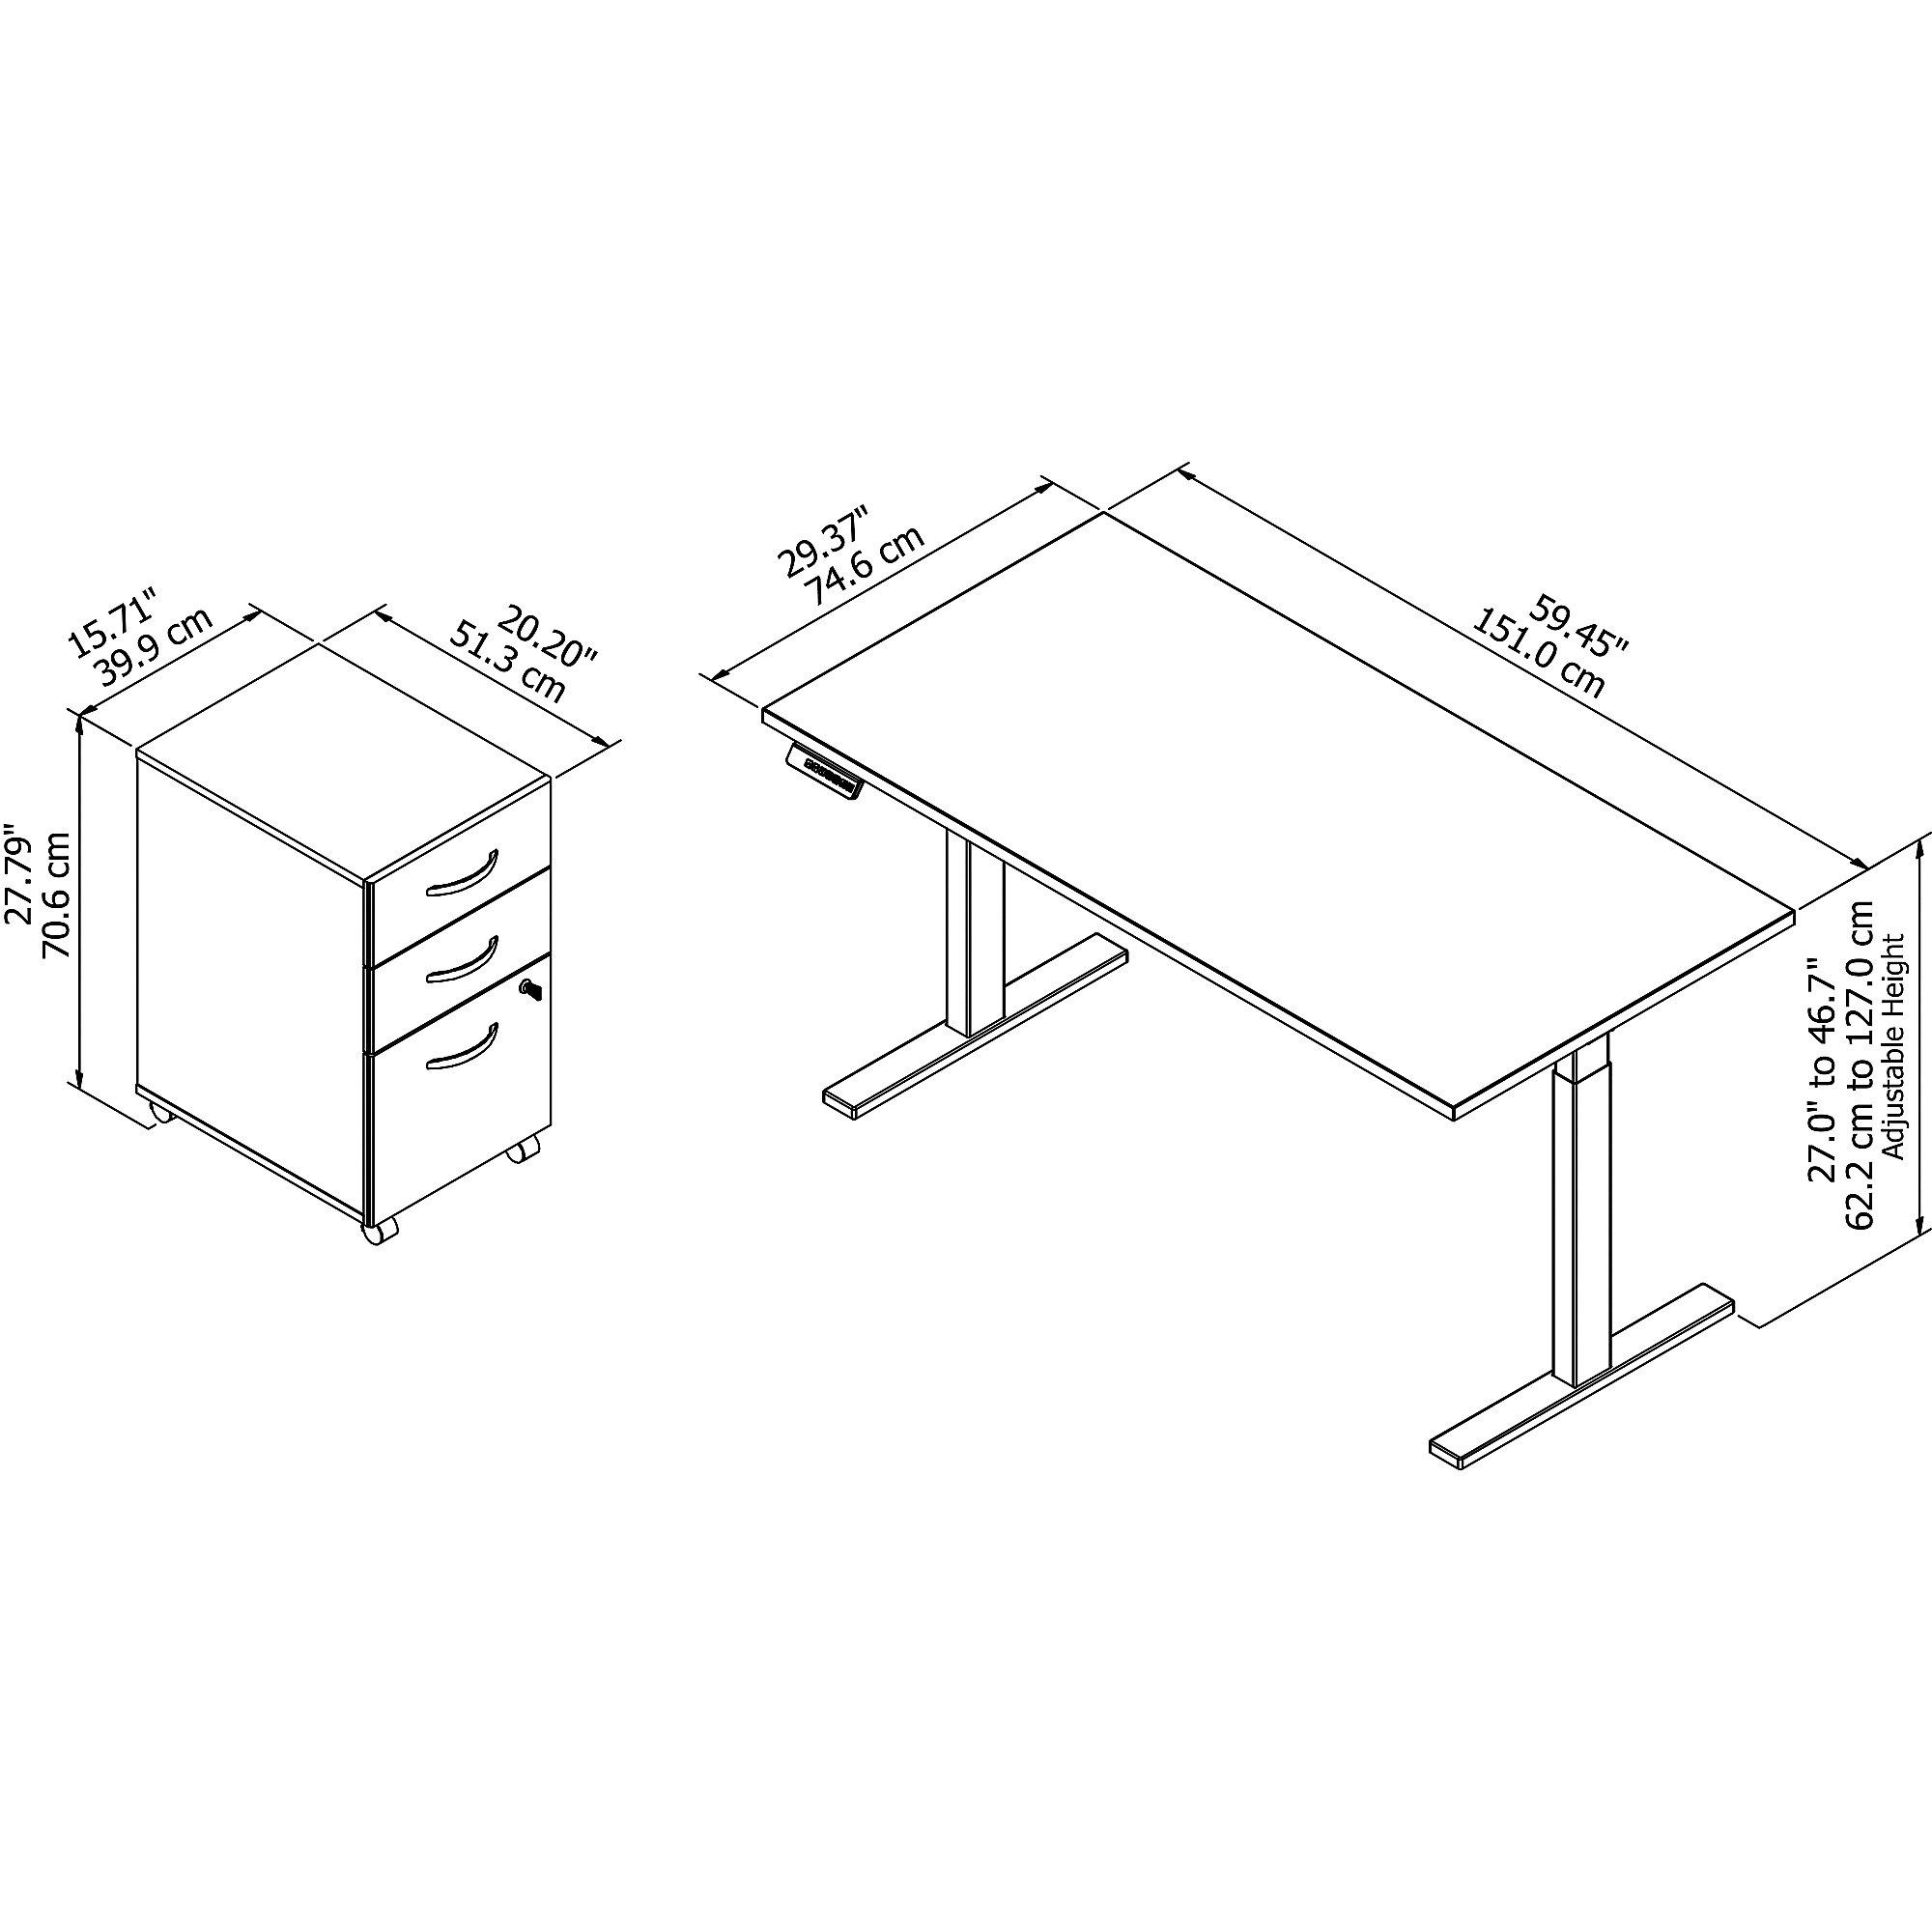 m6s011 dimensions